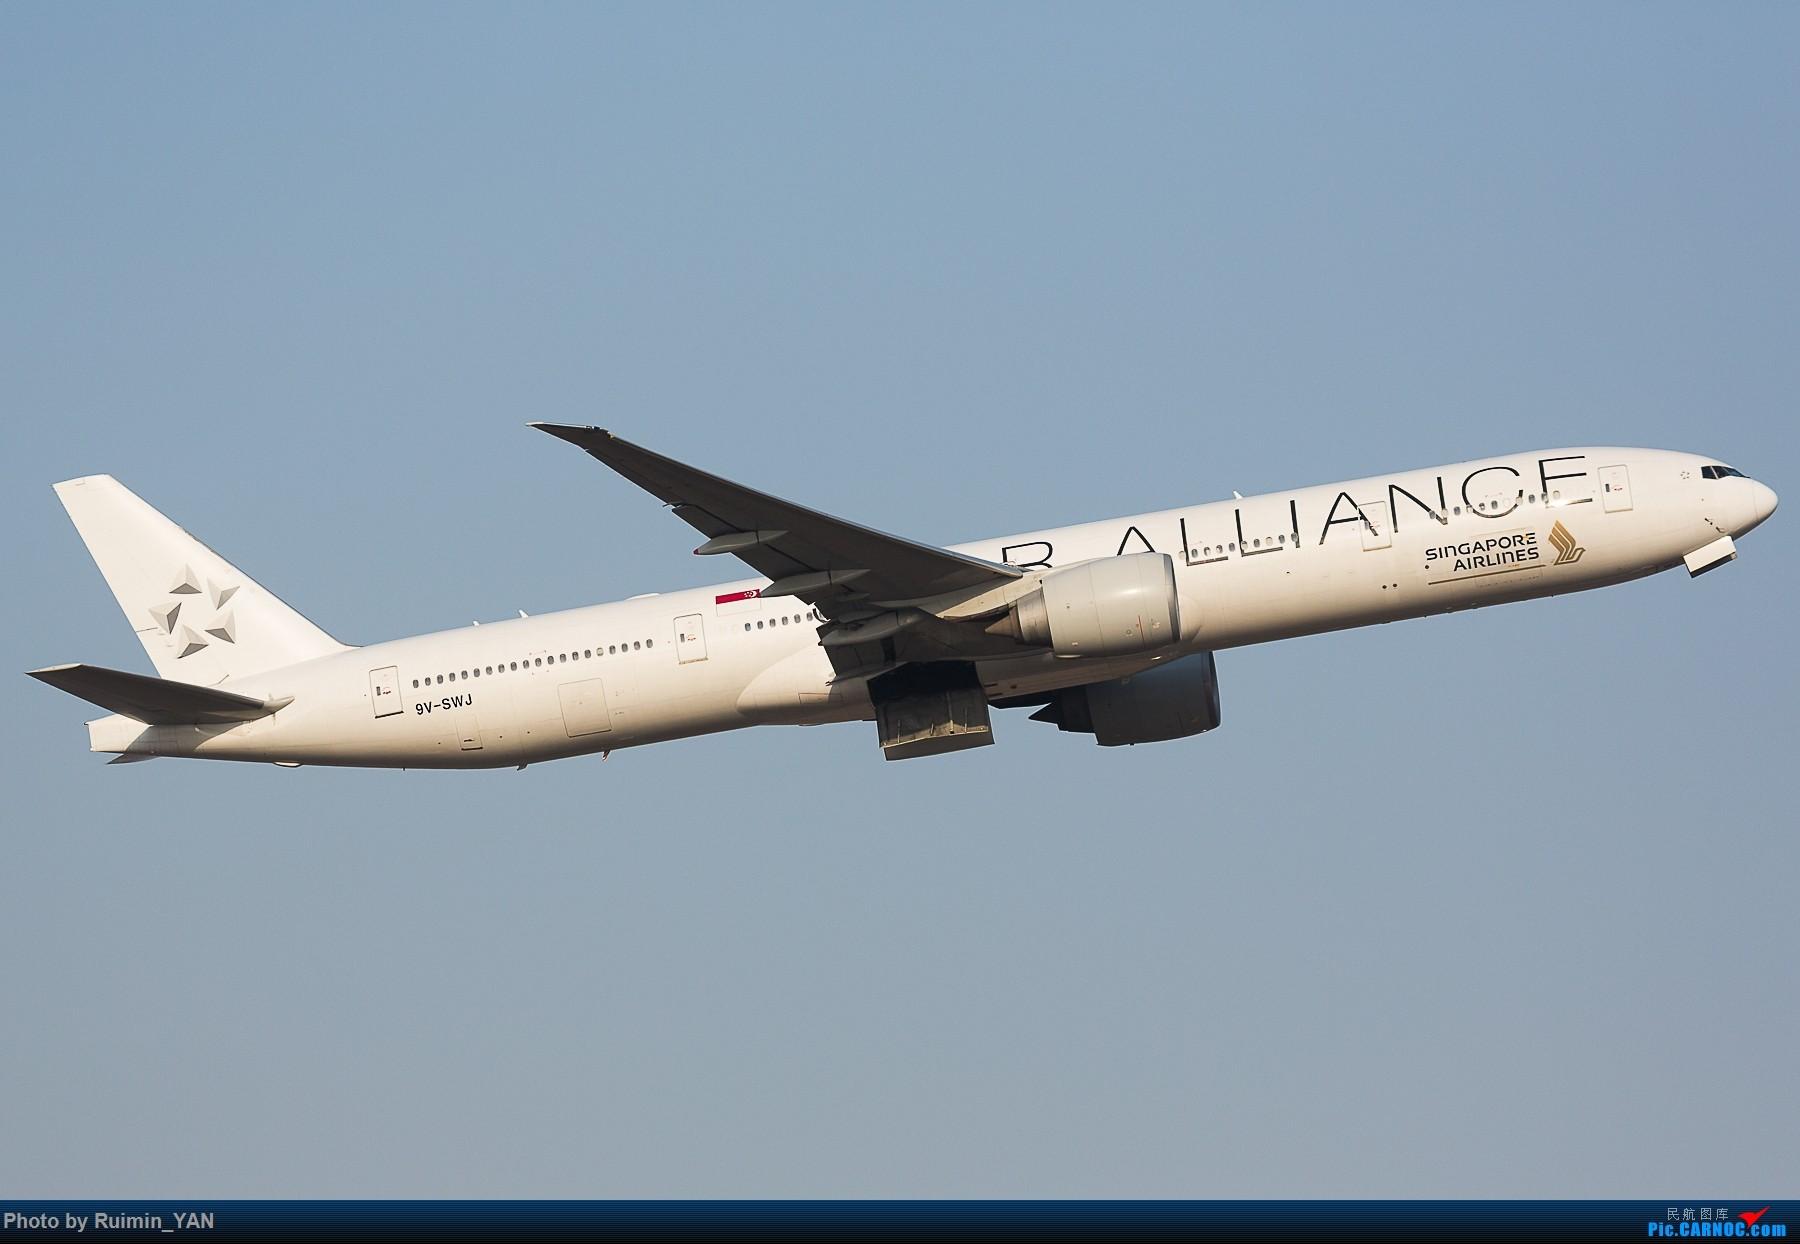 Re:【PEK飞友会】新加坡航空(SQ807)77W--白猩猩9V-SWJ,普装9V-SWN BOEING 777-300ER 9V-SWJ 中国北京首都国际机场